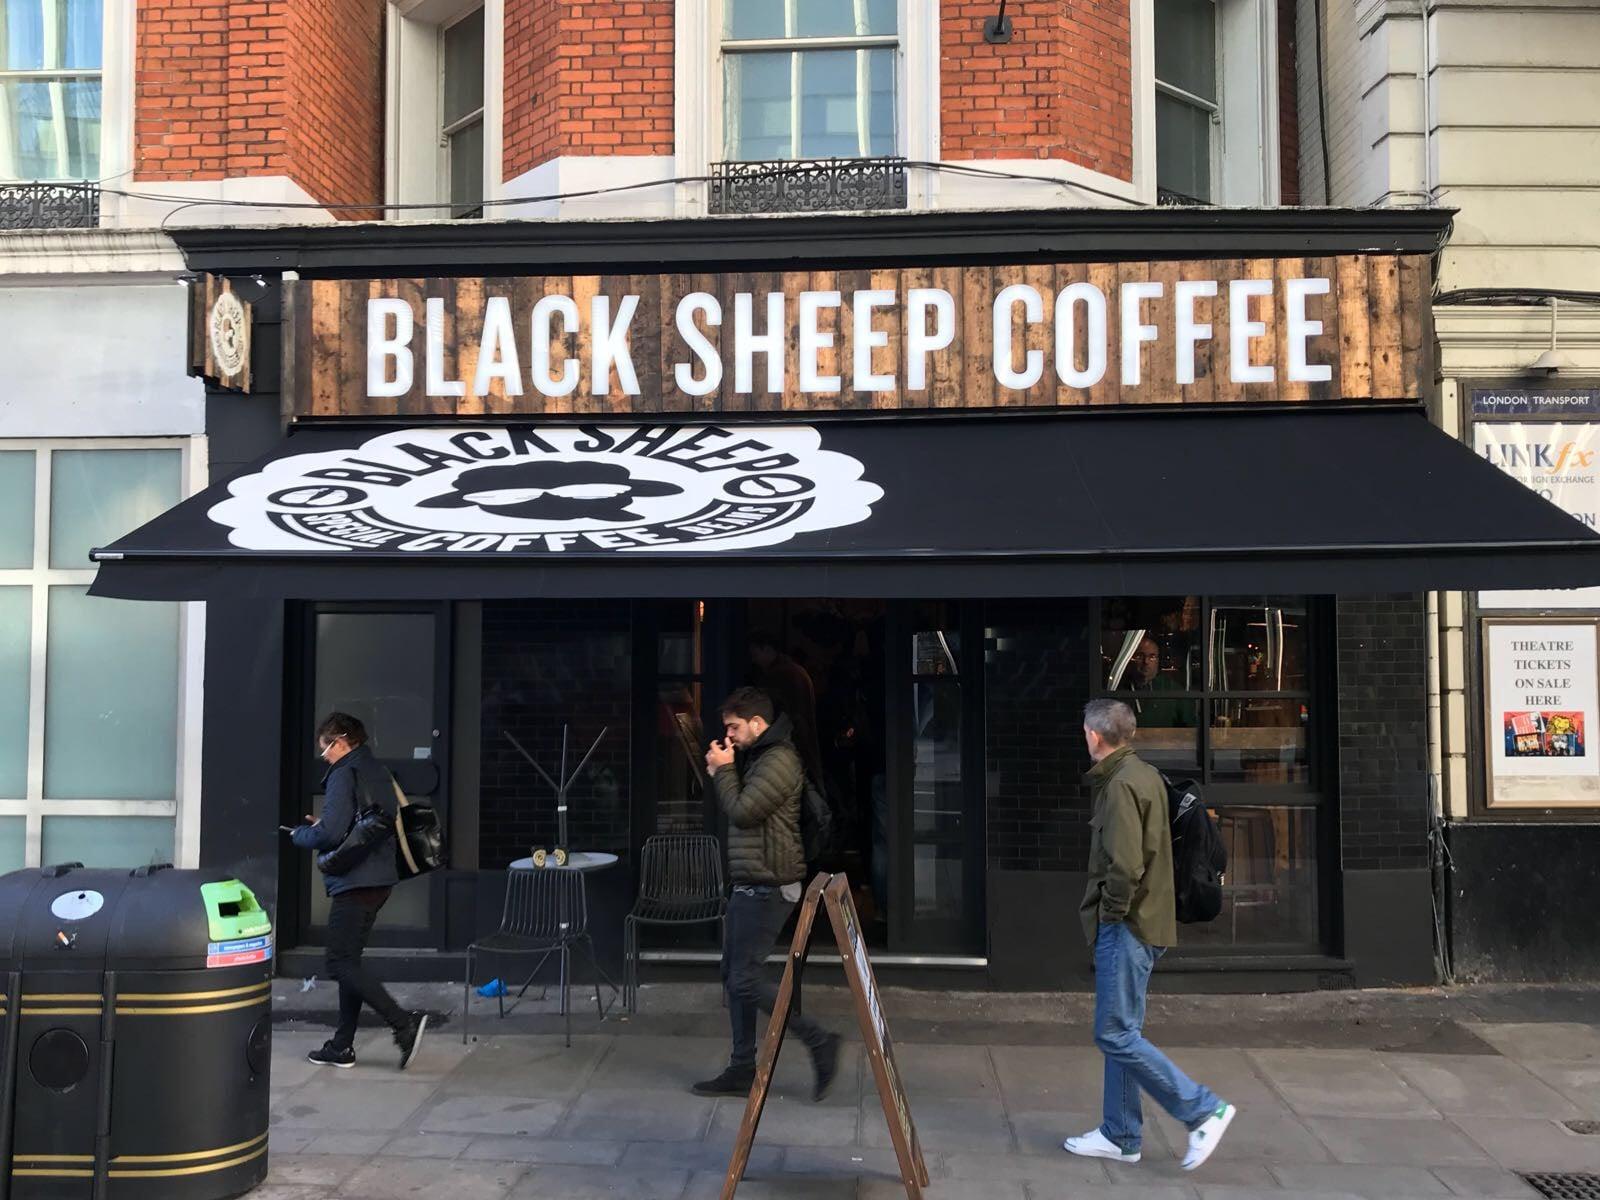 Black Sheep Coffee London Radiant Blinds Ltd